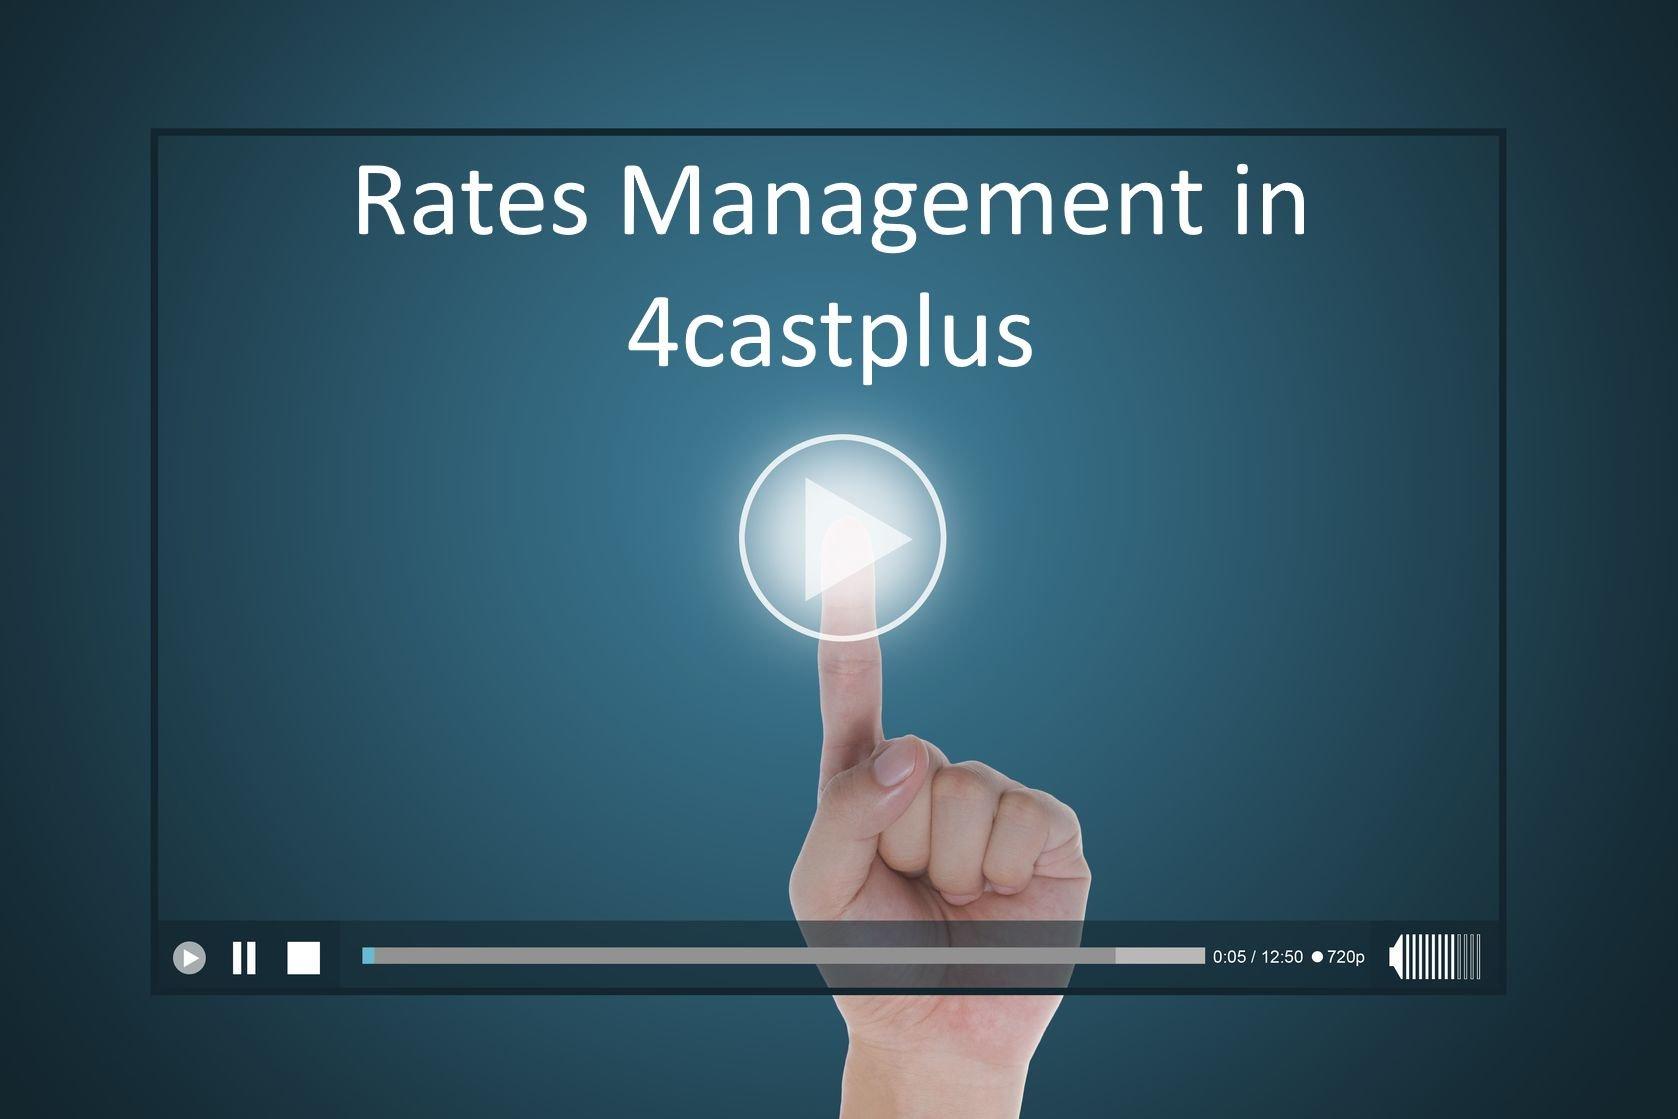 Rates Management